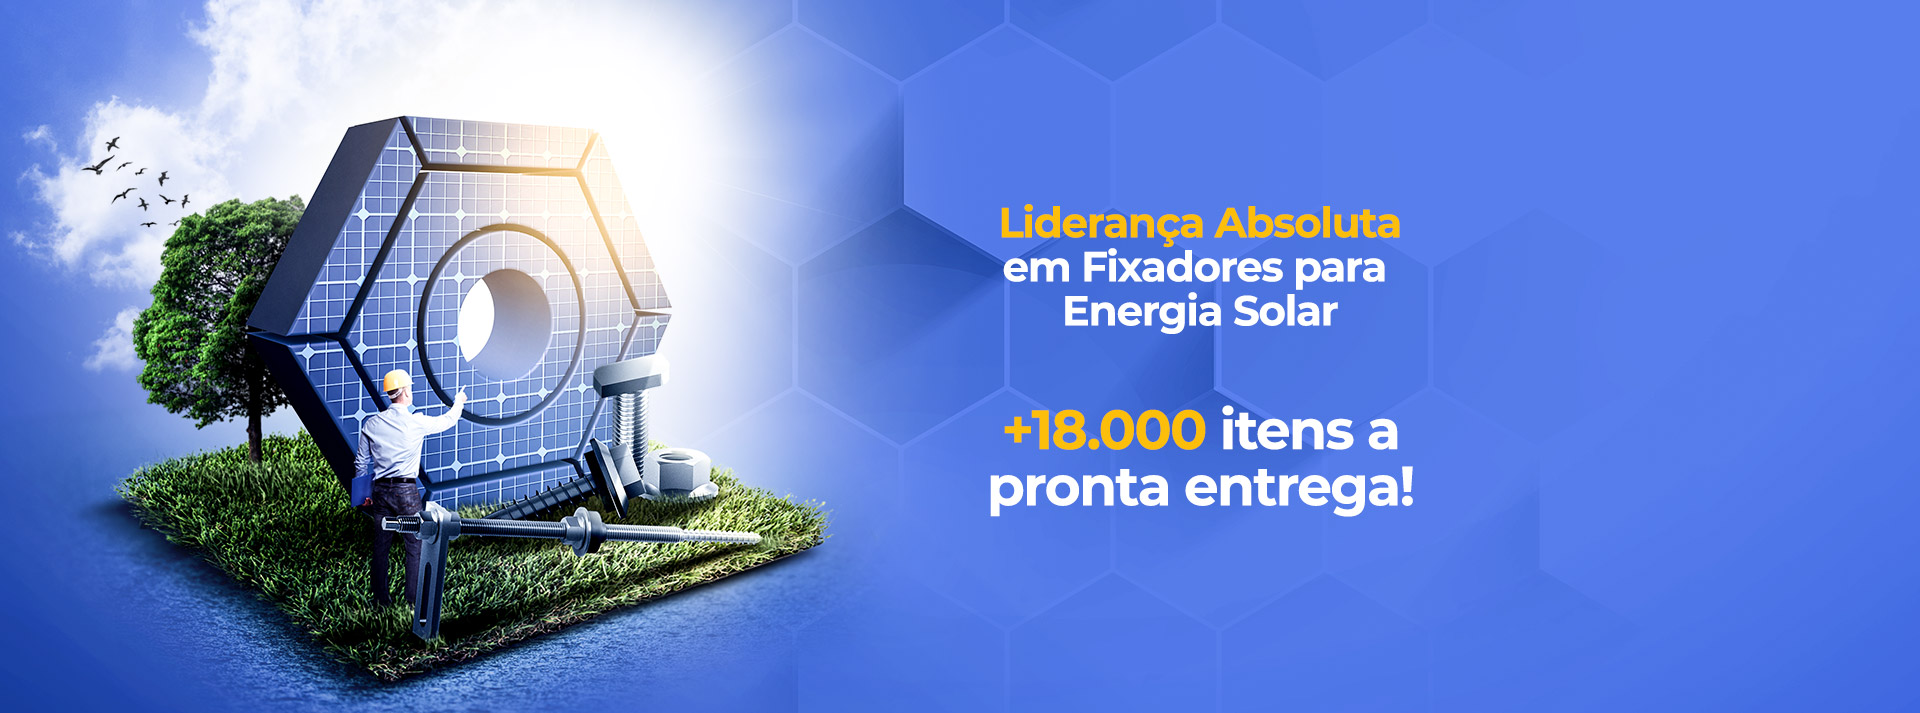 fixadores painéis solares